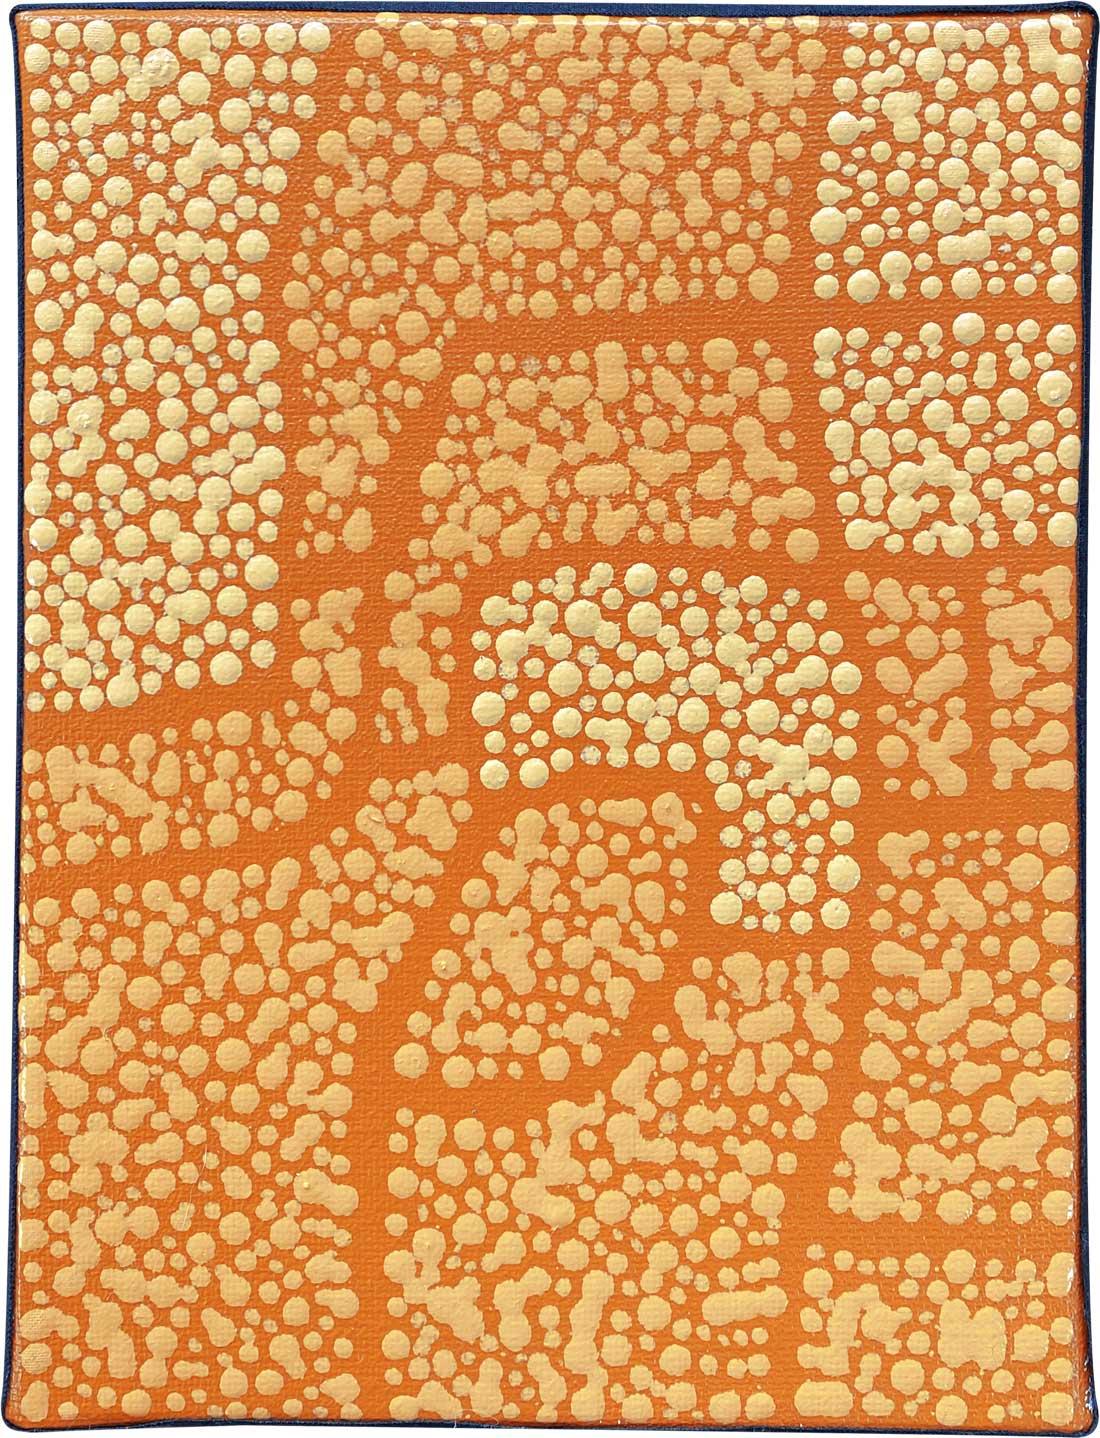 sans-titre(mini-orange-blanc-fond-orange)-packshot